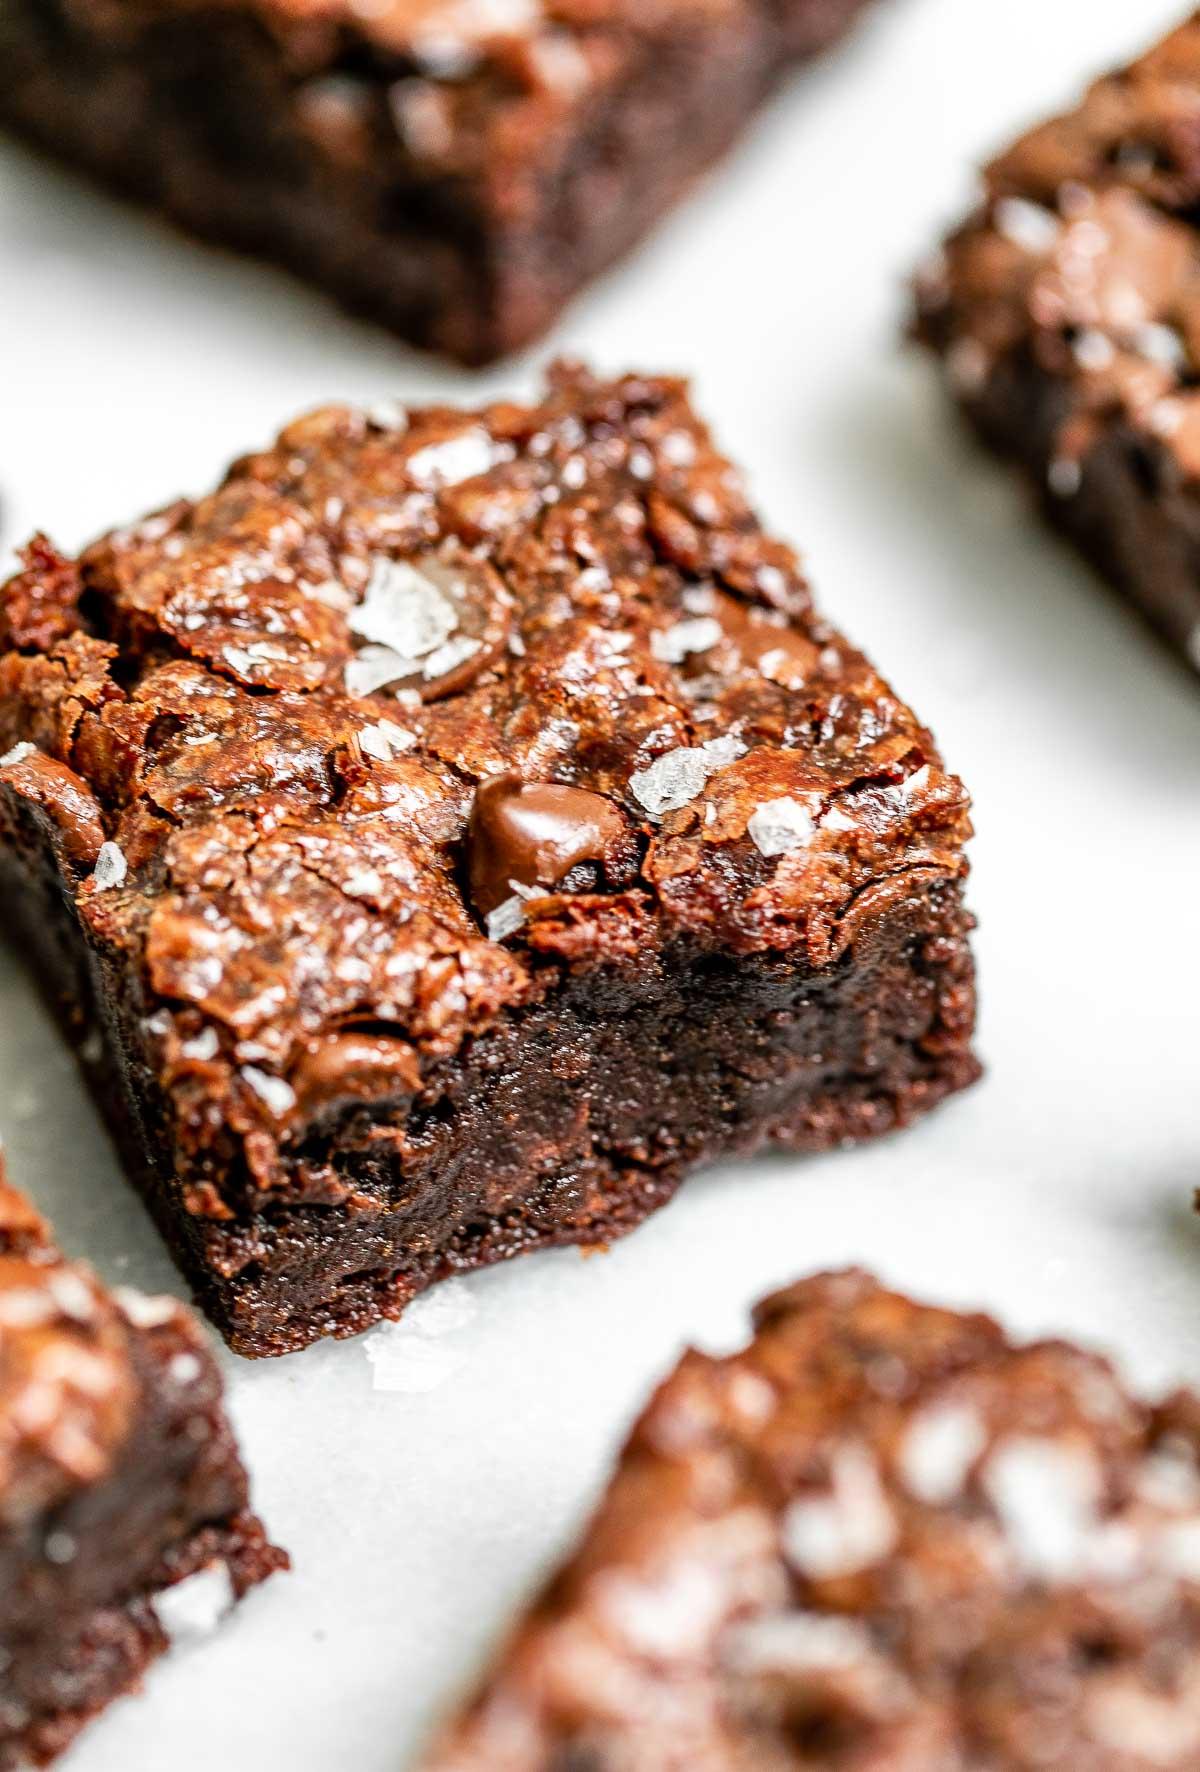 Vegan brownies on a marble backdrop with sea salt sprinkled on top.